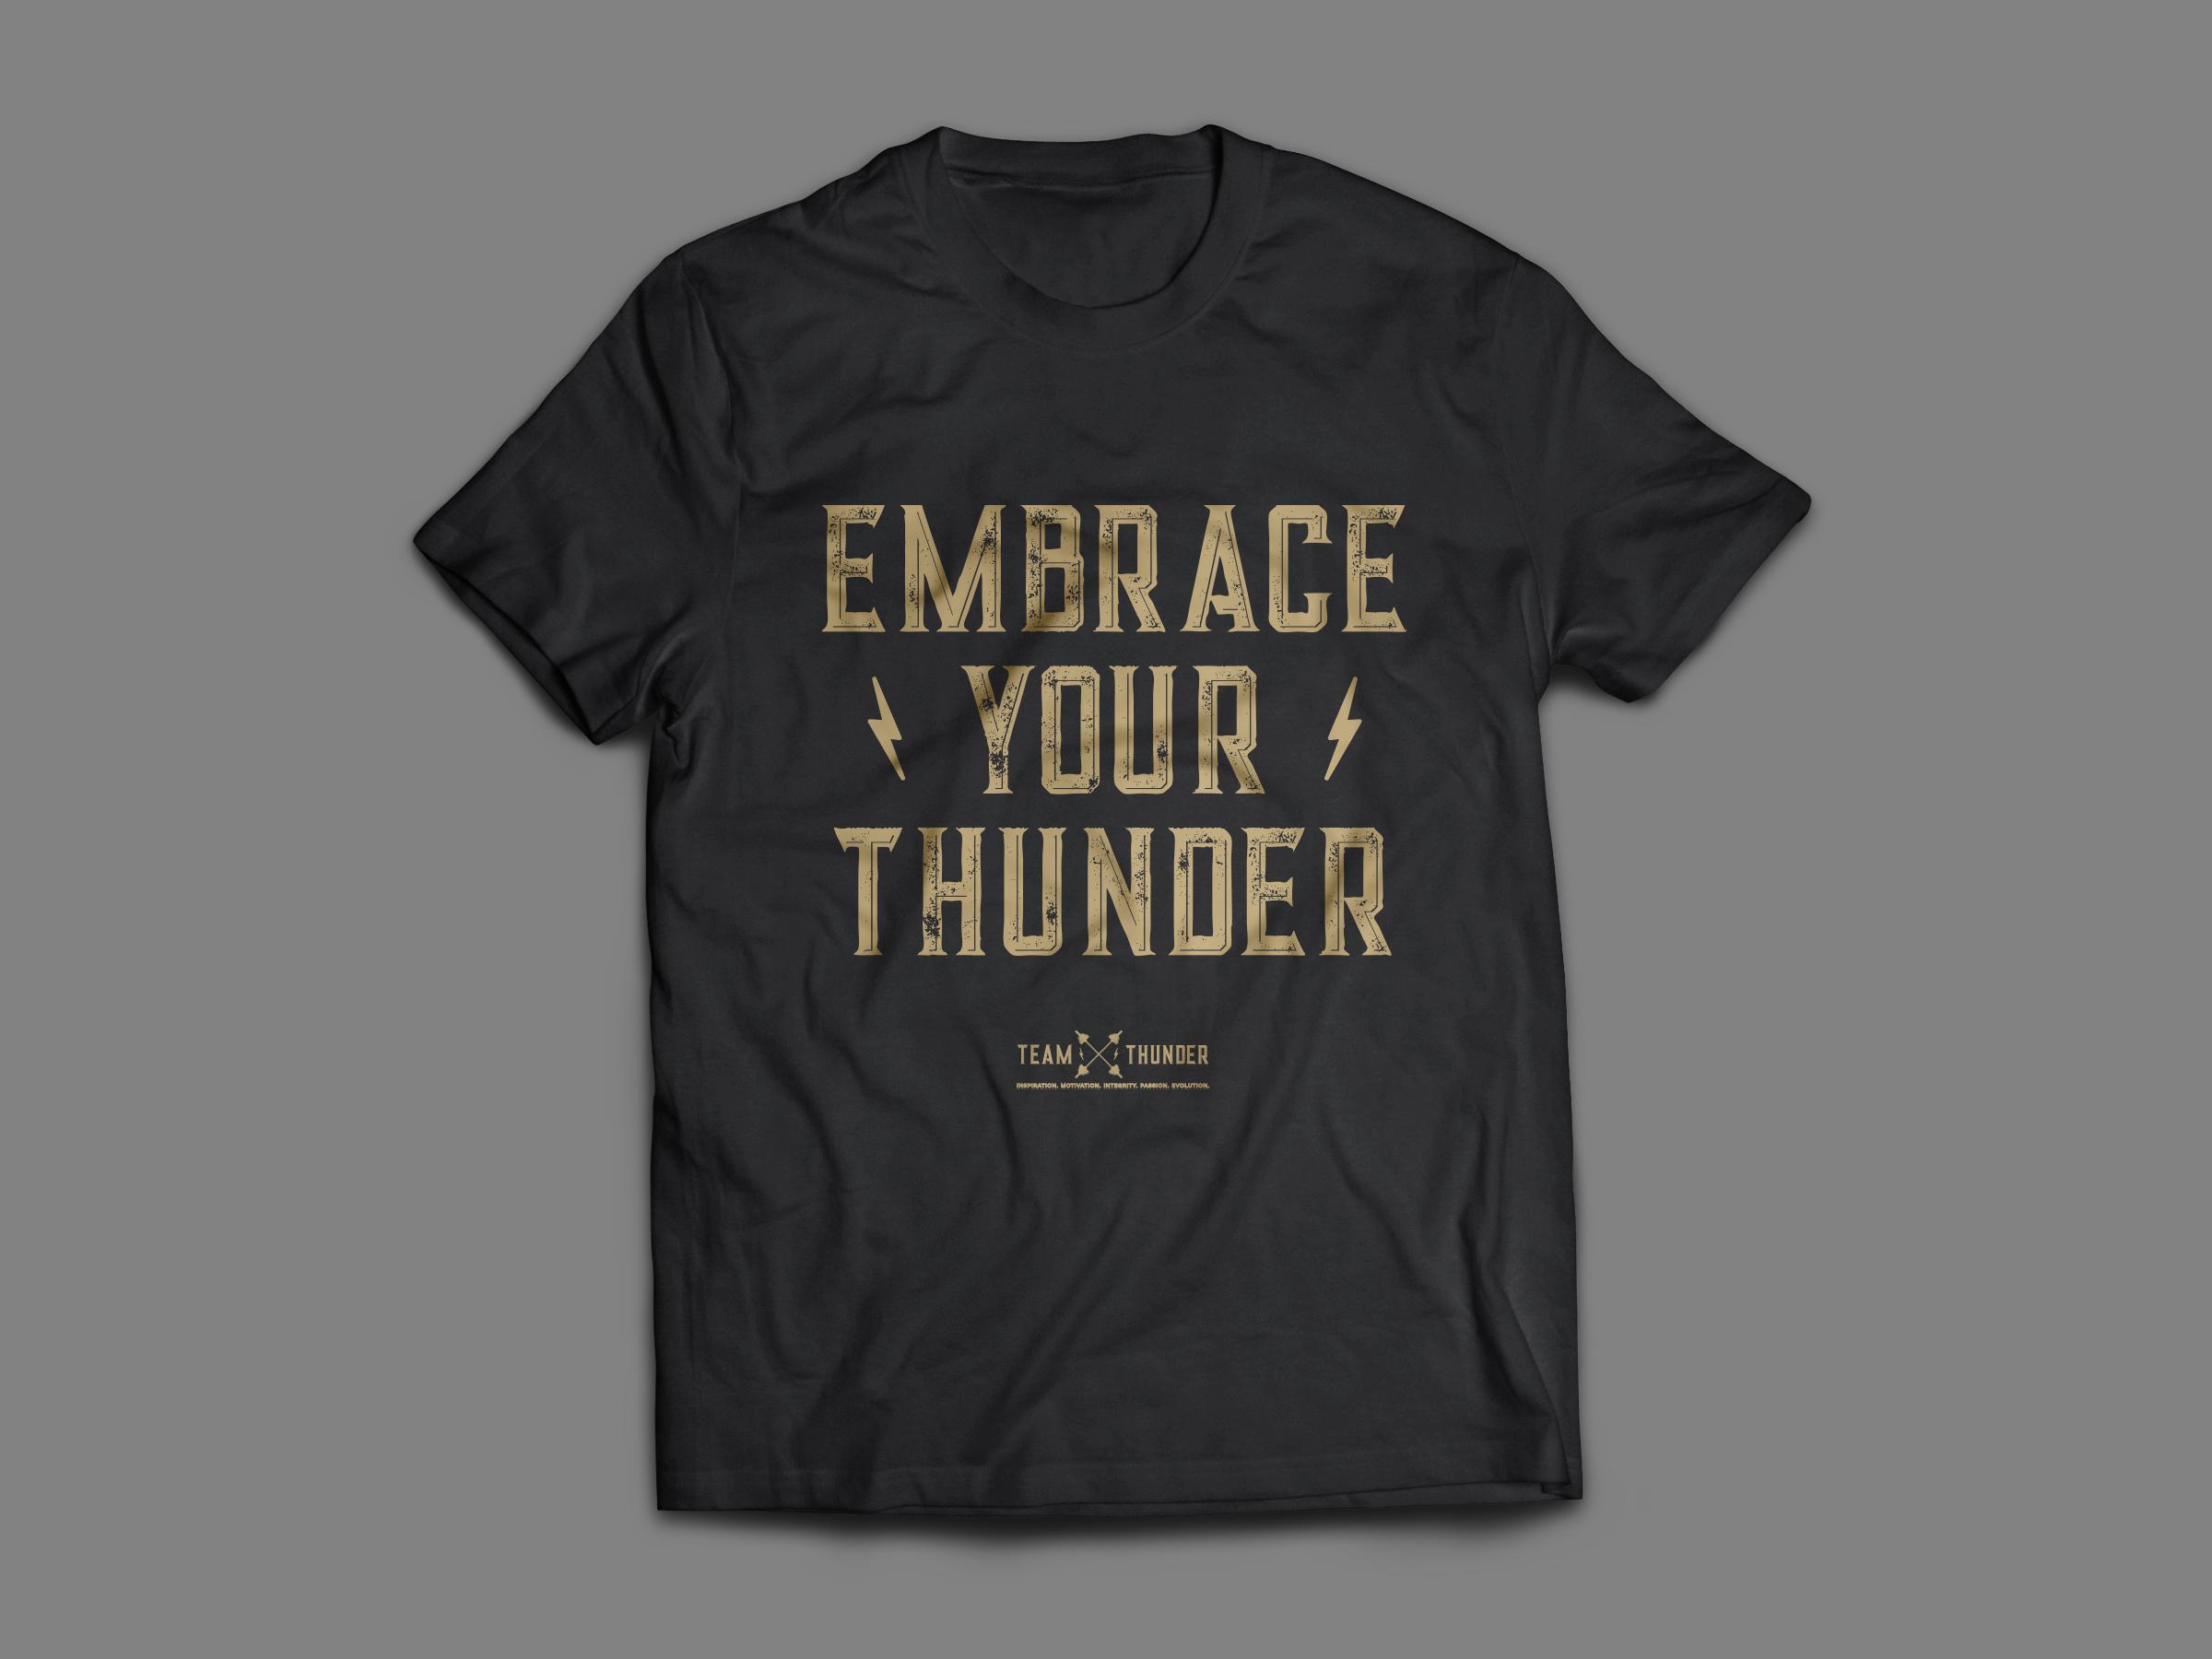 _embrace_T-Shirt MockUp_Front.png